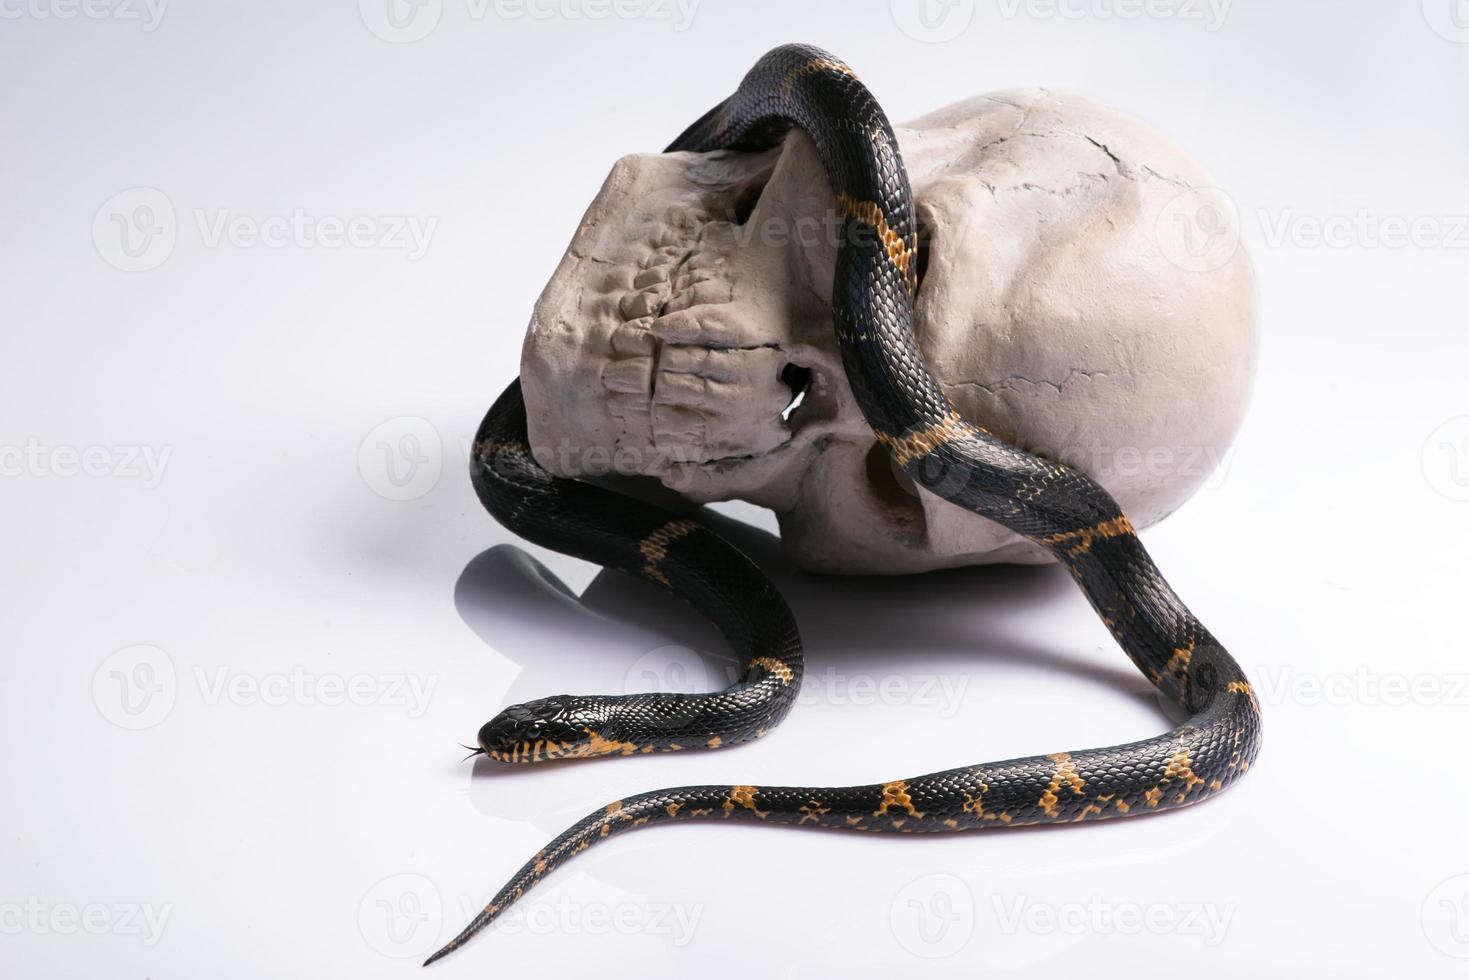 reptiles sobre fondo blanco foto